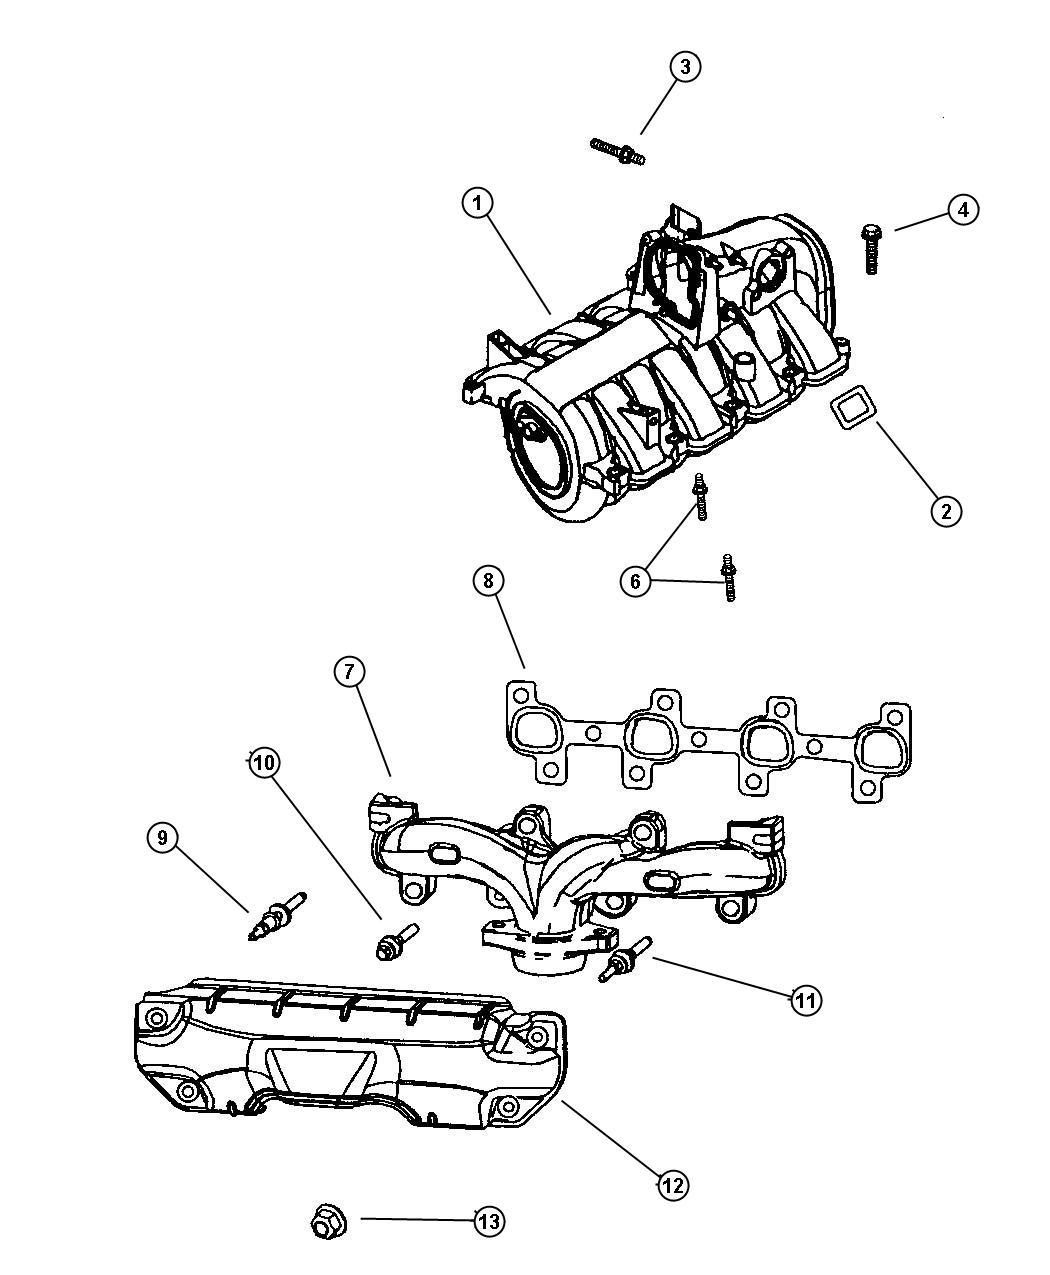 Dodge Ram Manifold Exhaust Left